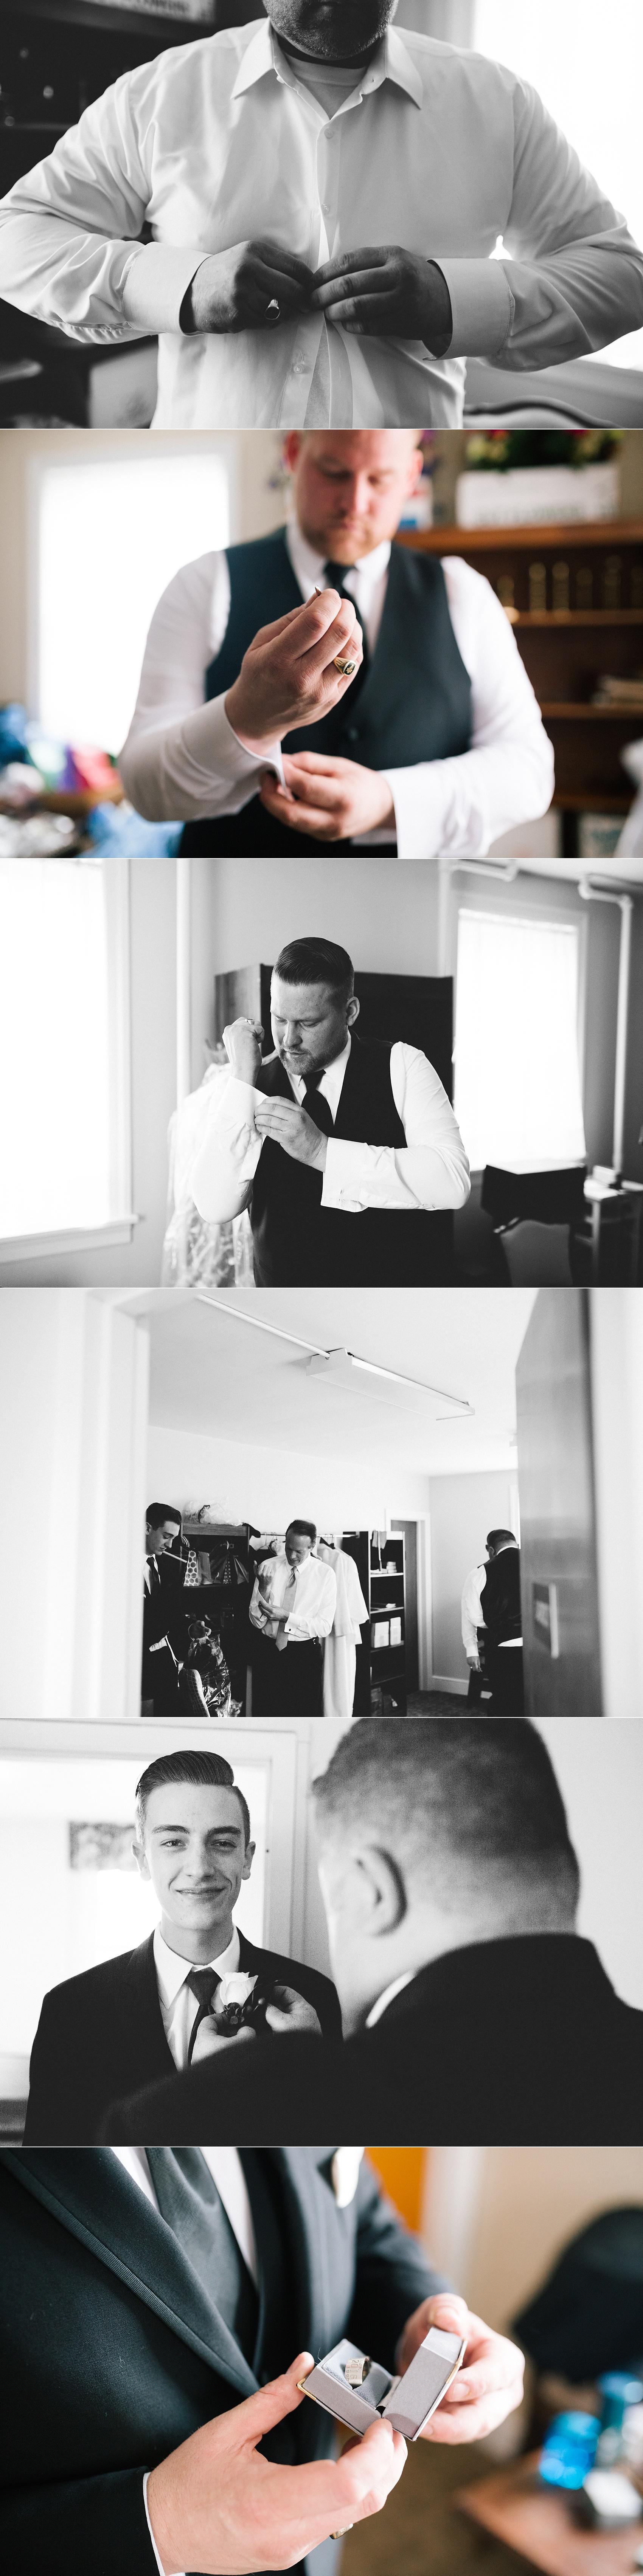 dwayne lydia delaware wedding philadelphia baltimore washingtion dc wedding photographer-4